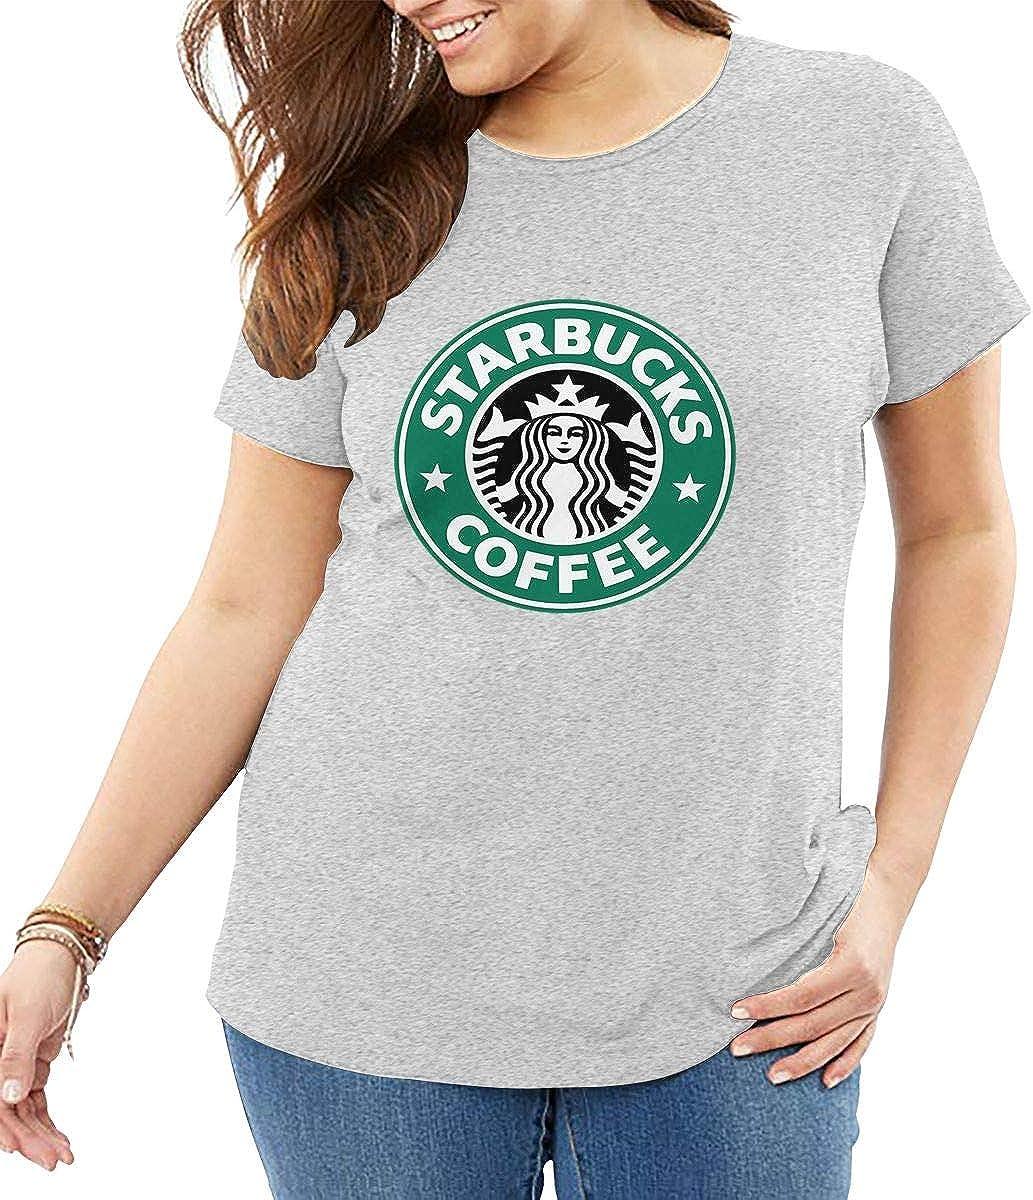 Camiseta de Manga Corta con Logo de Starbucks para Mujer, Cuello ...